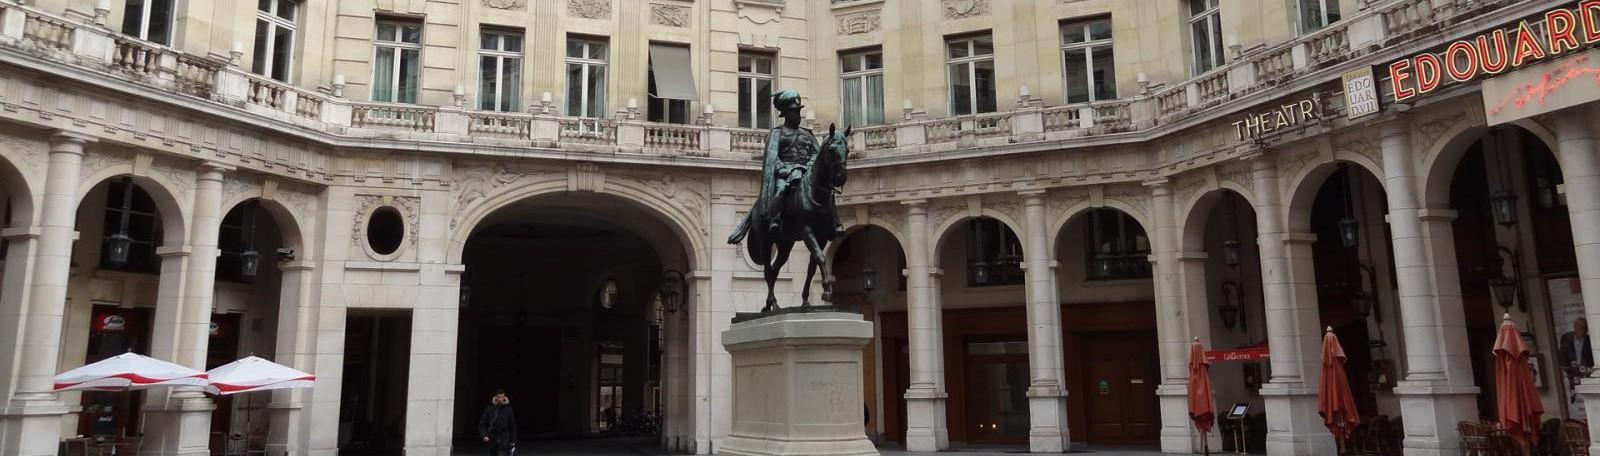 Parking Edouard VII - Olympia - Haussmann - Rue Bruno Coquatrix (face au 23 Rue de Caumartin) 75009 Parijs